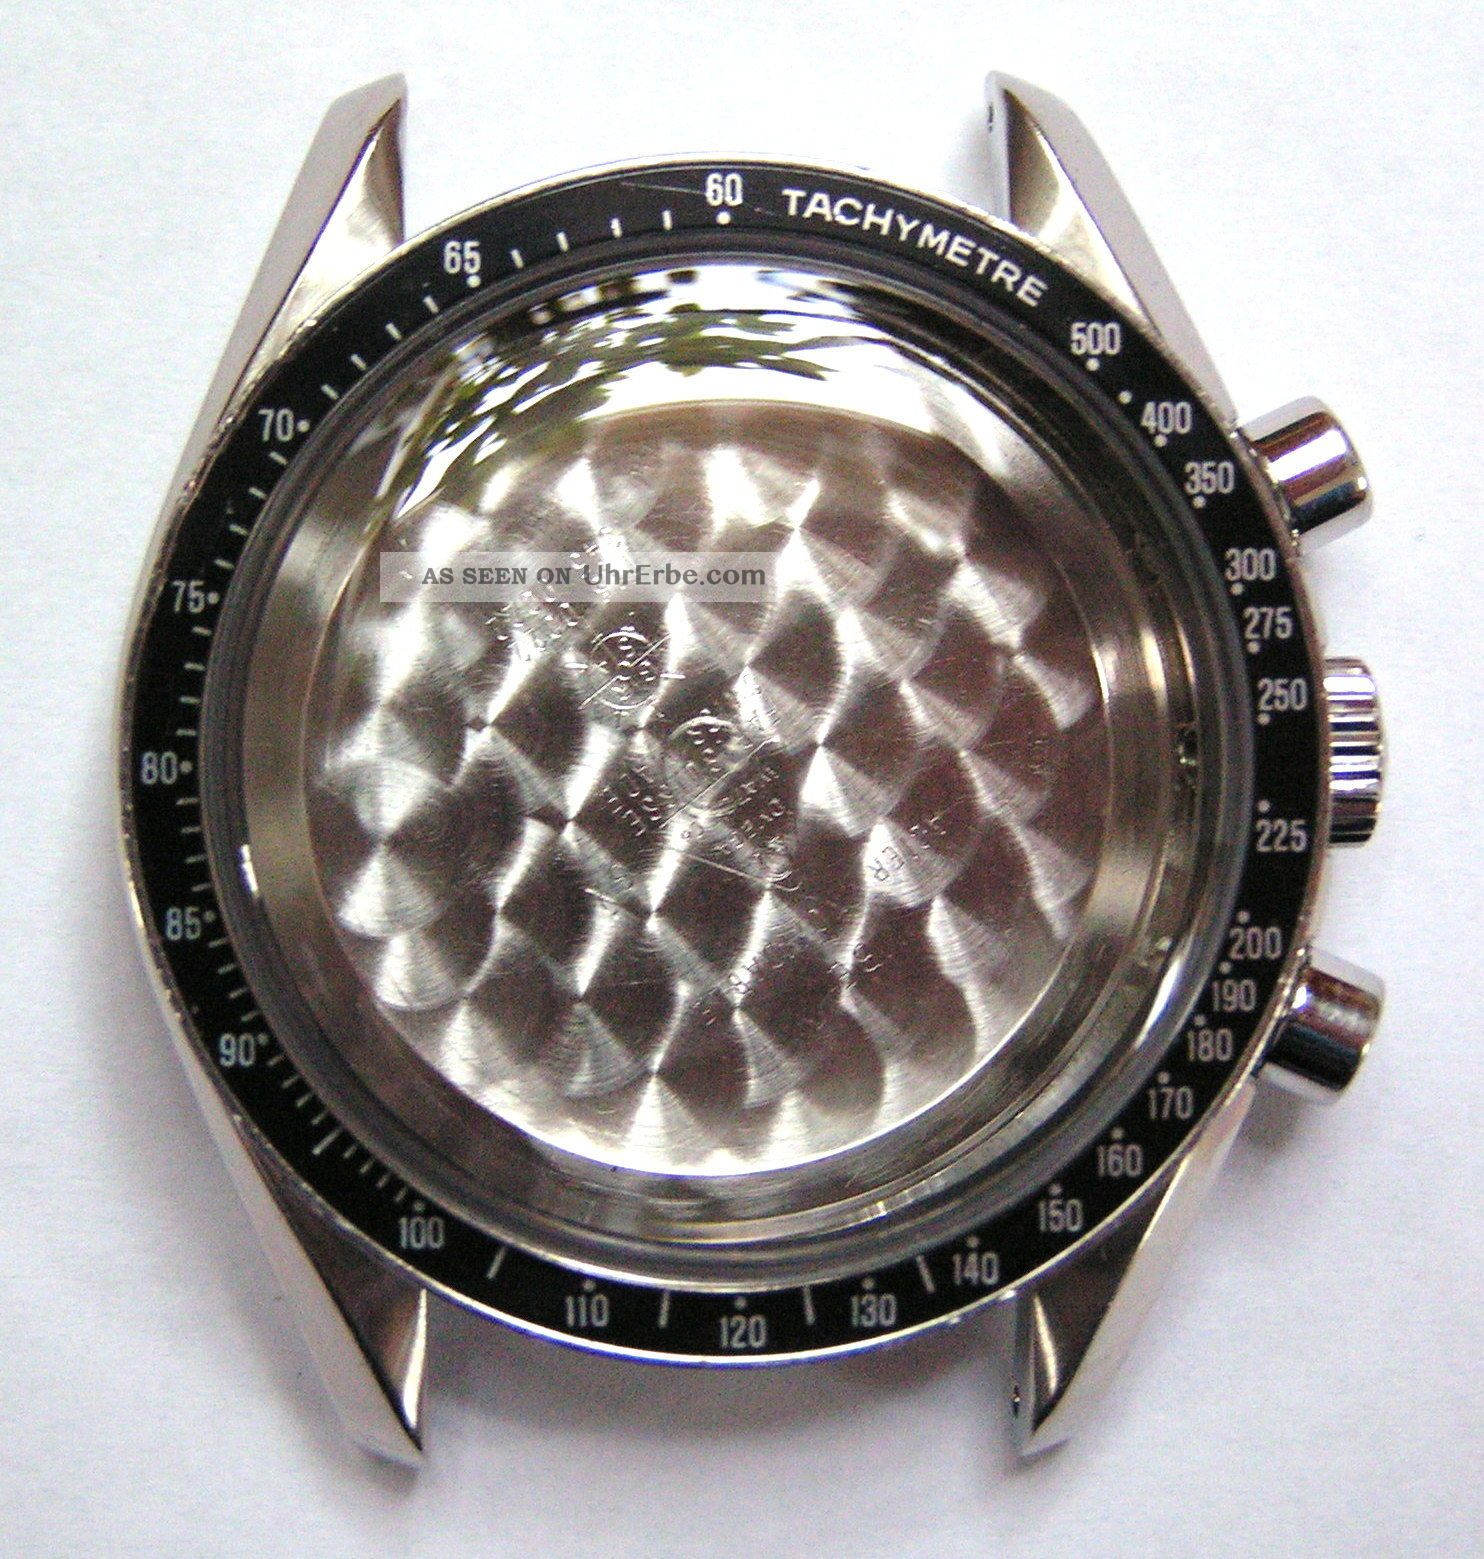 Omega Speedmaster Professional Moonwatch Watch Case 145.  0022 Armbanduhren Bild